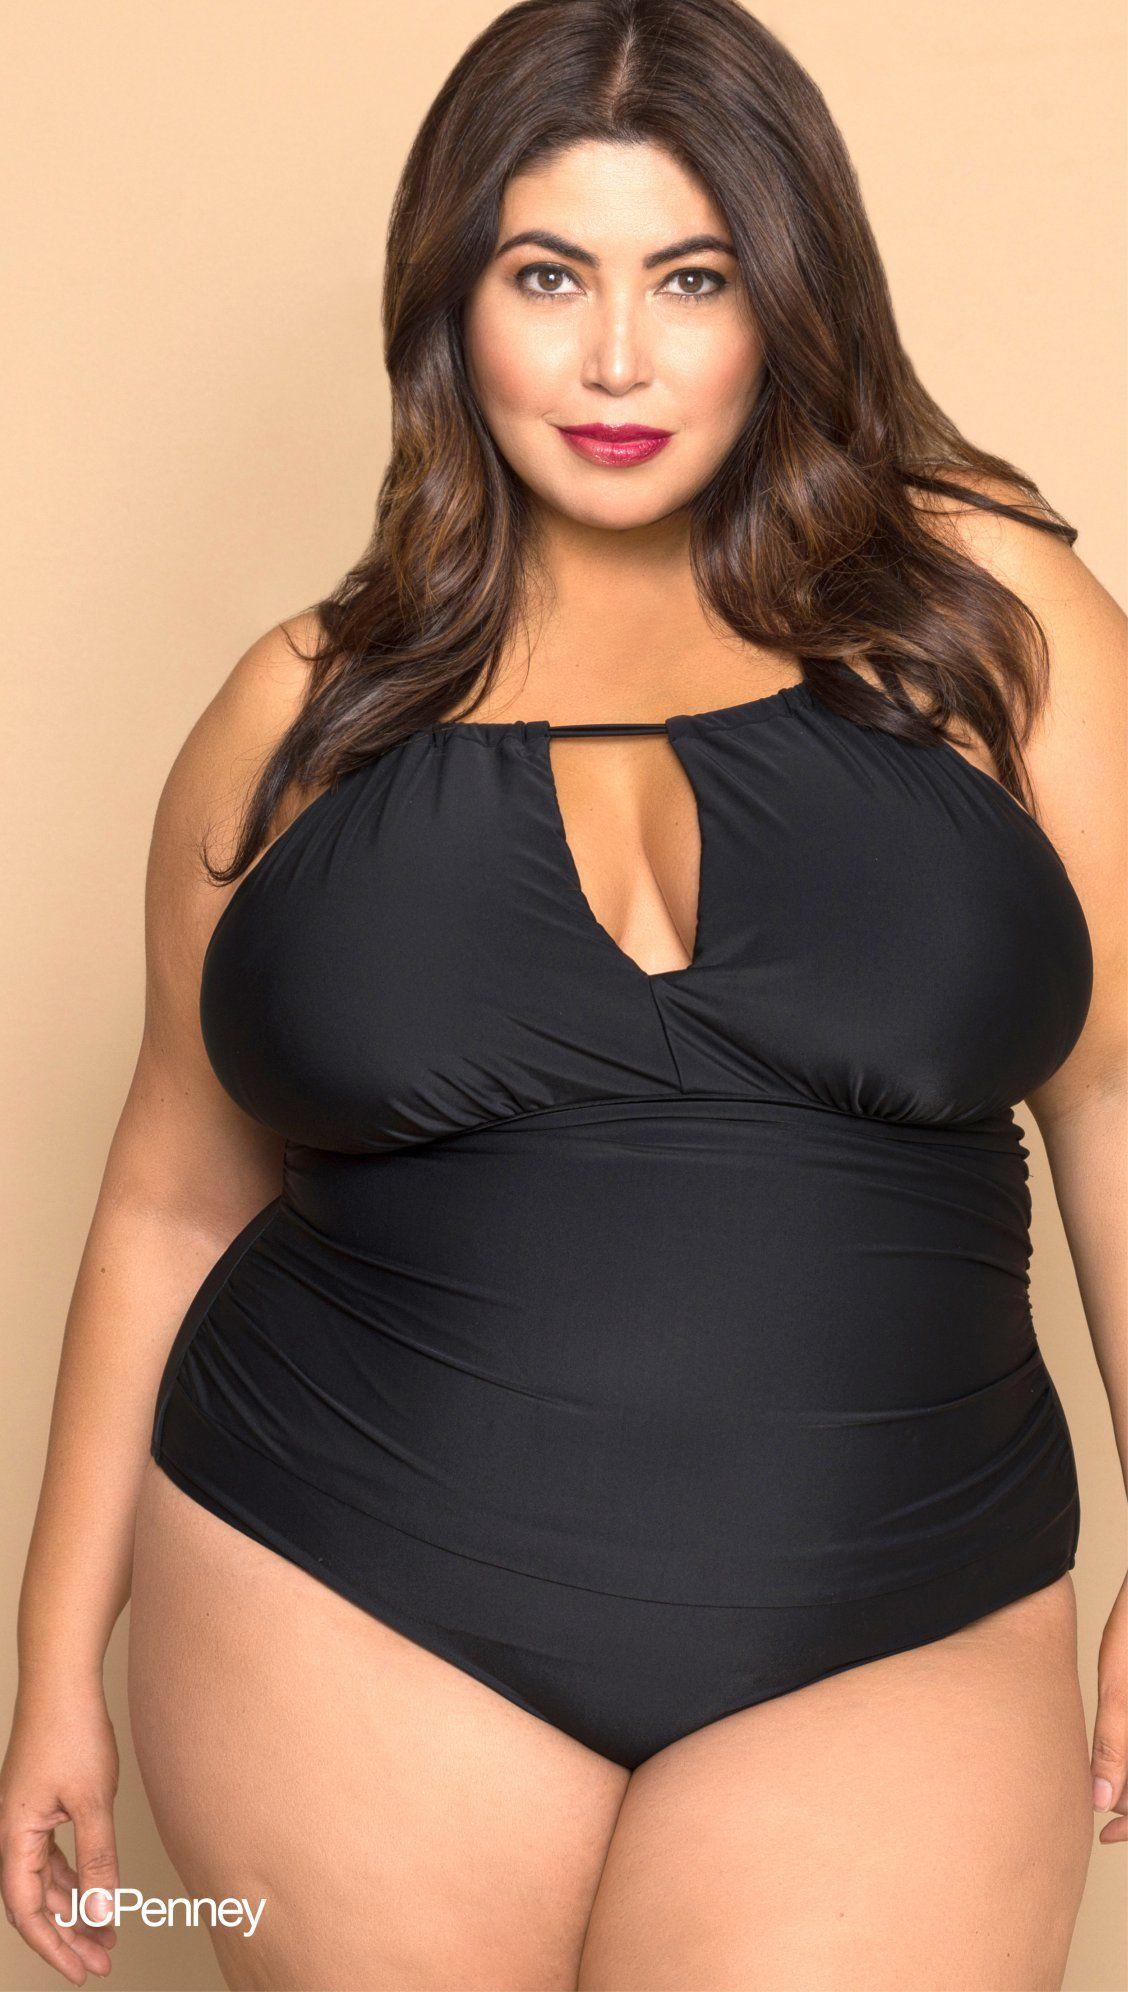 07ed3e72bb8 A black one-piece plus size bathing suit is a summer staple. This suit